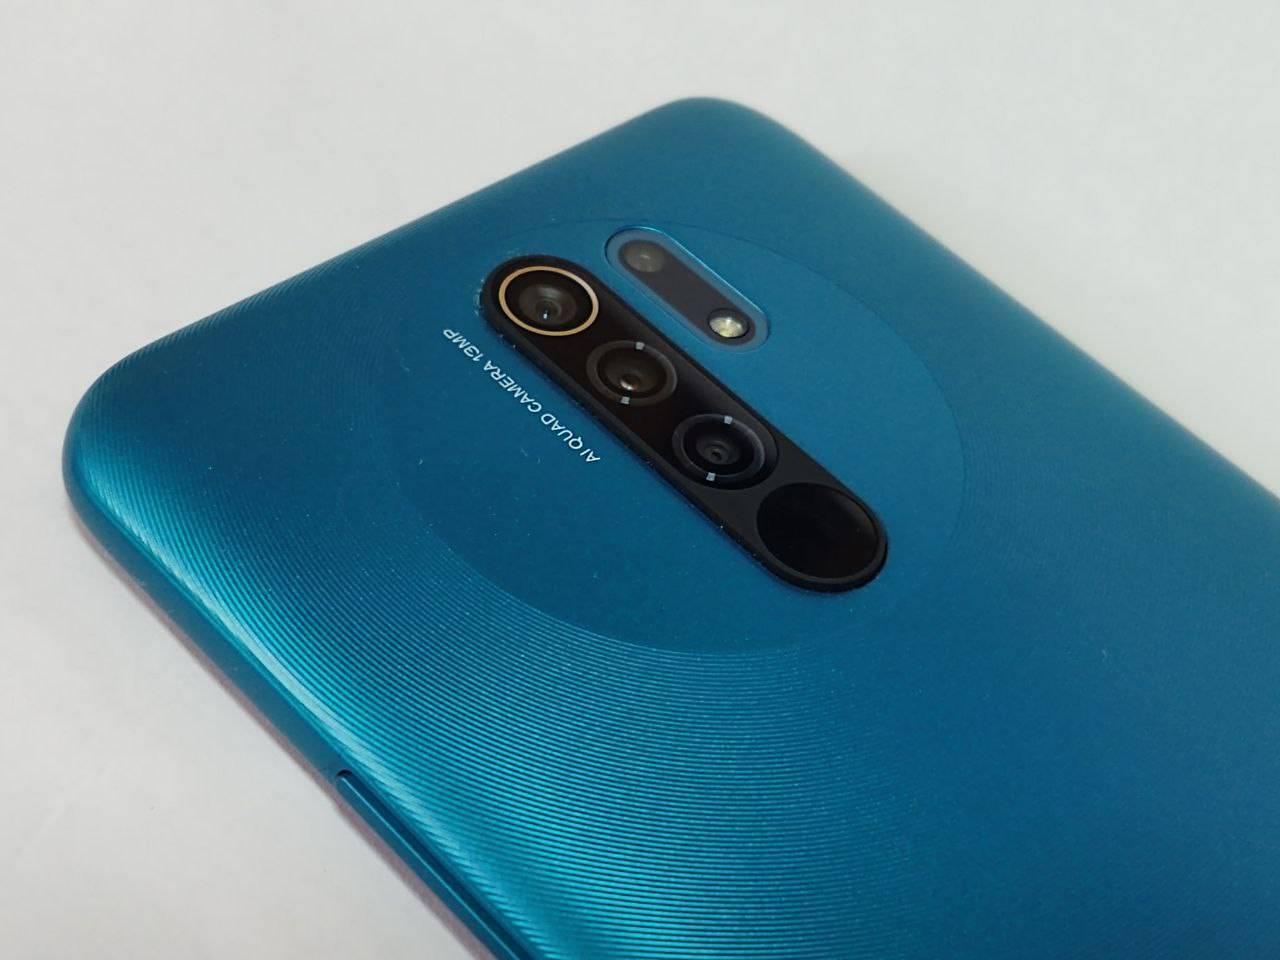 Xiaomi Redmi 9 review